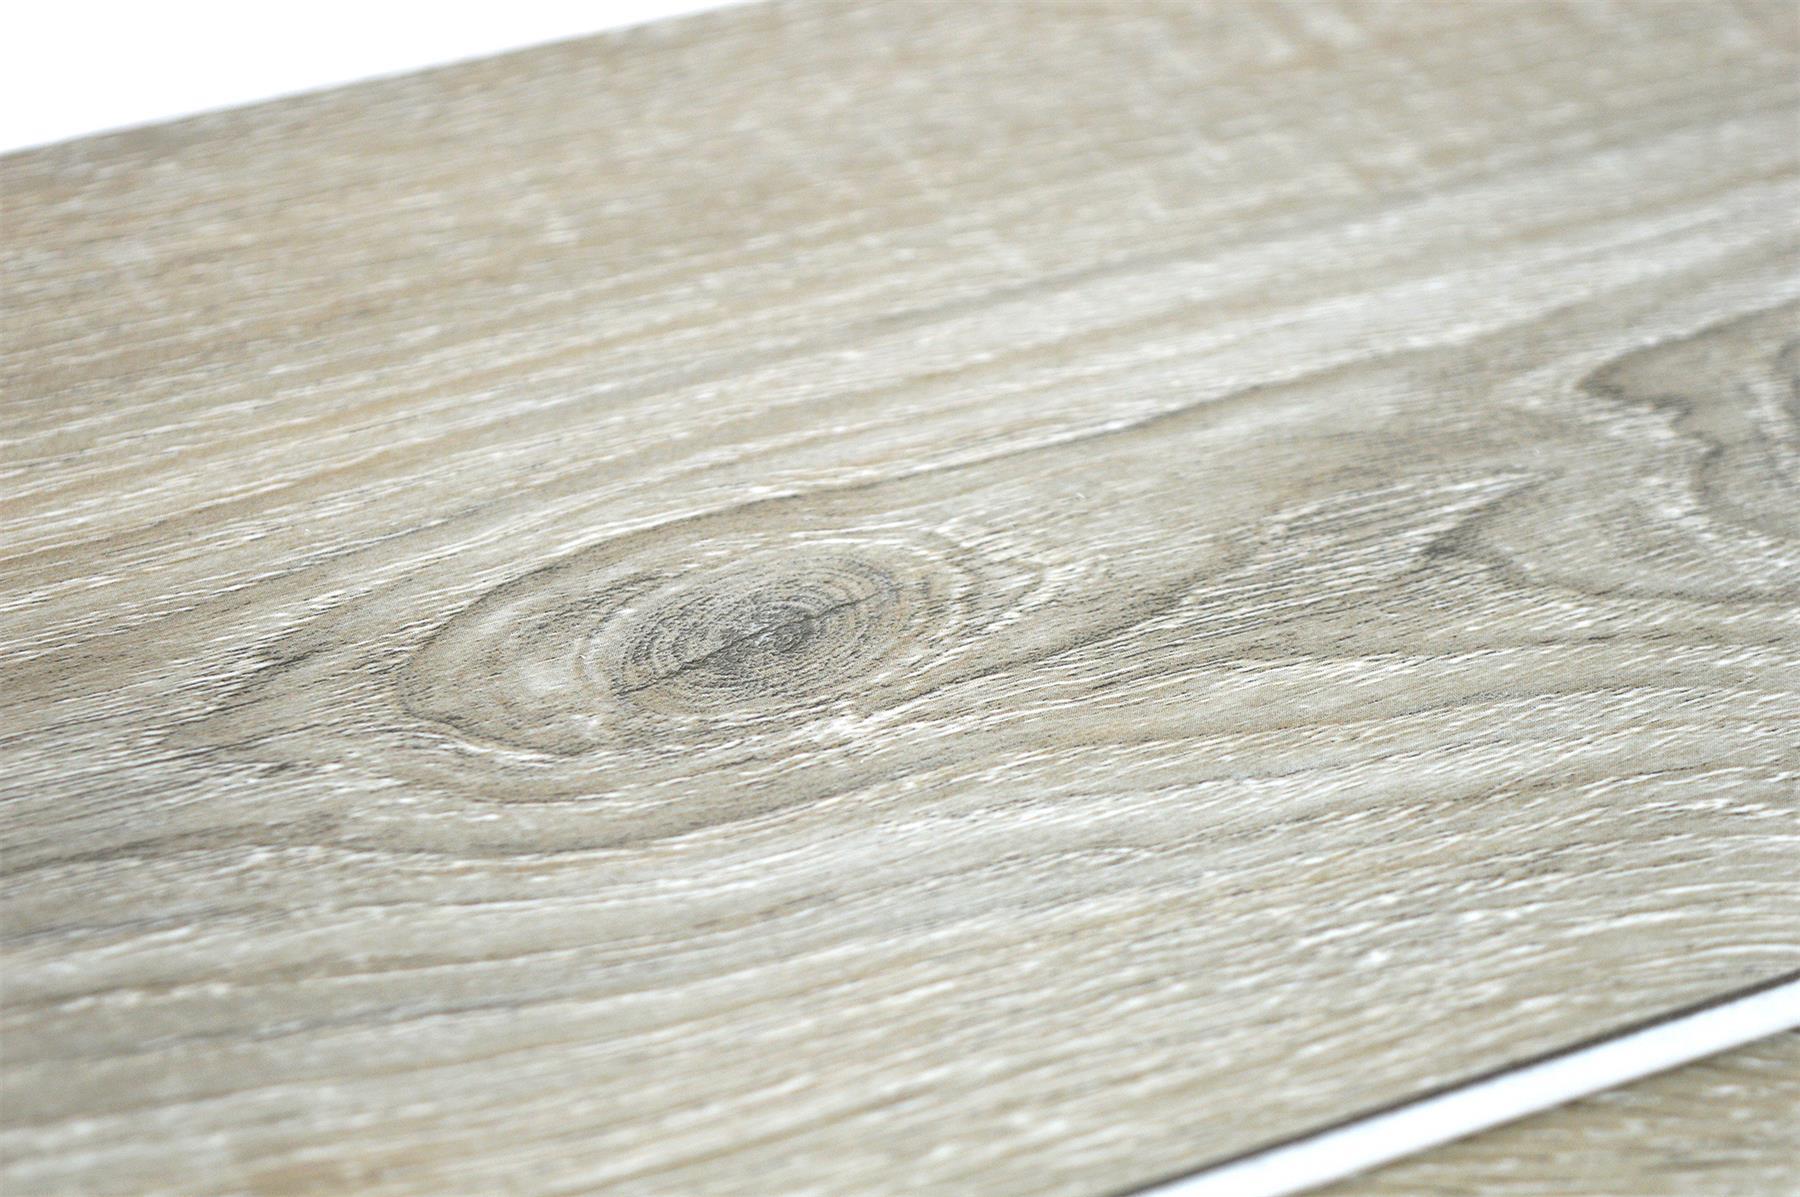 Floor Planks Tiles Self Adhesive Light Grey Wood Vinyl ...